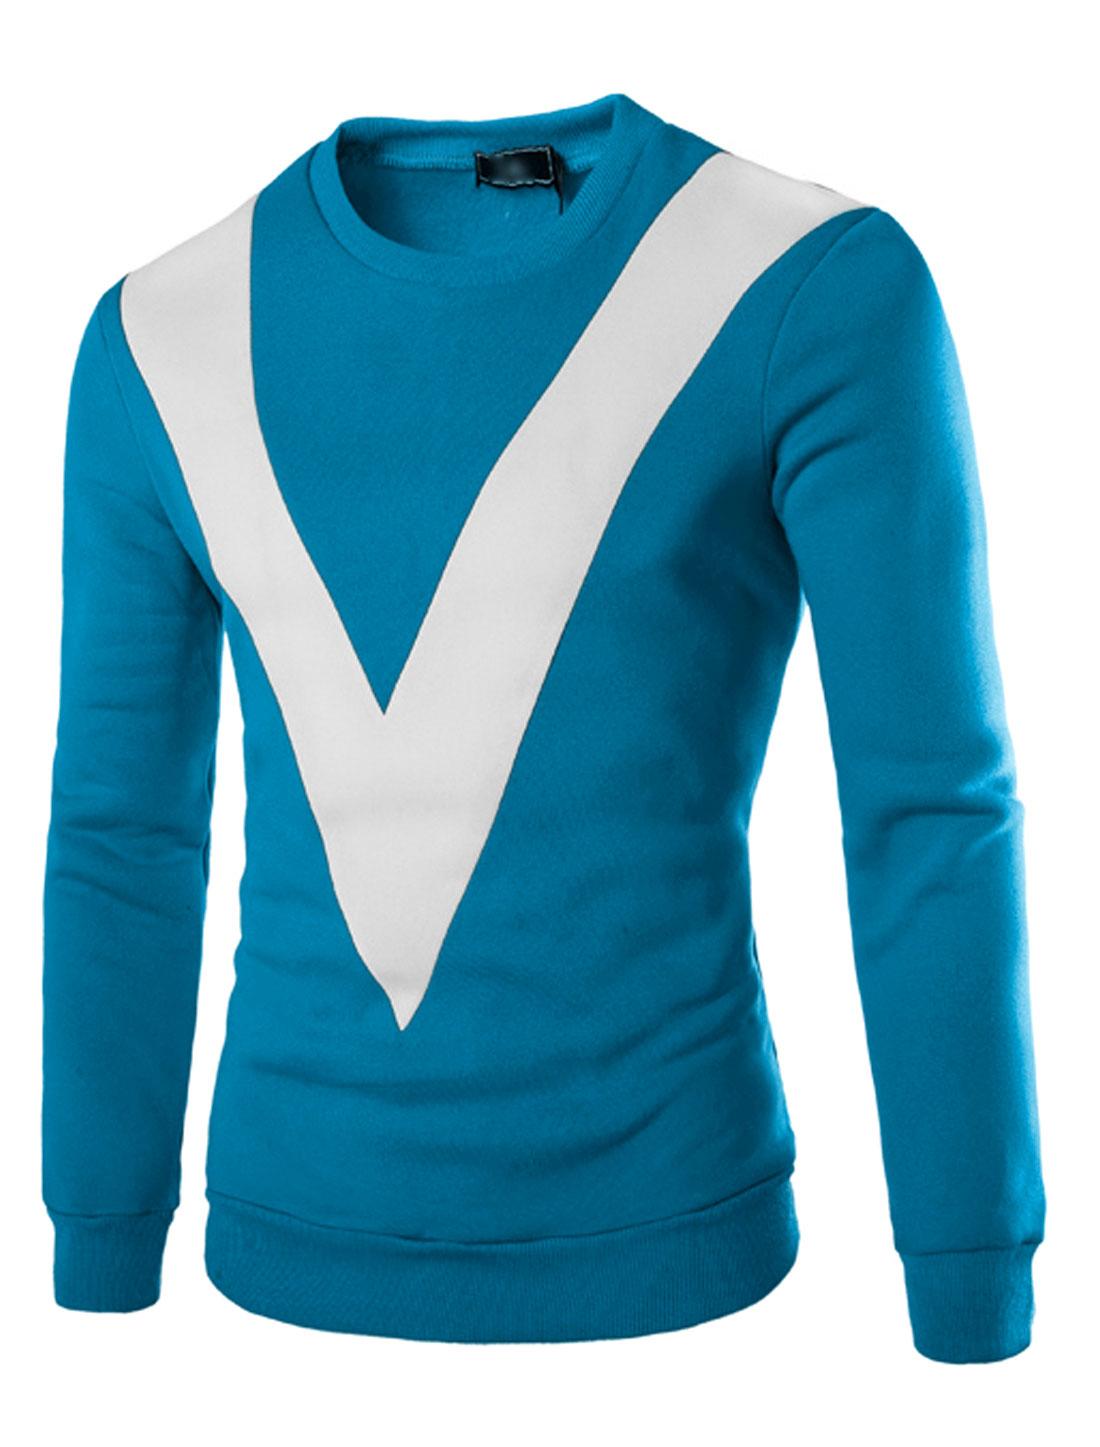 Man Contrast Color V-Shaped Panel Soft Lined Sweatshirt Blue M